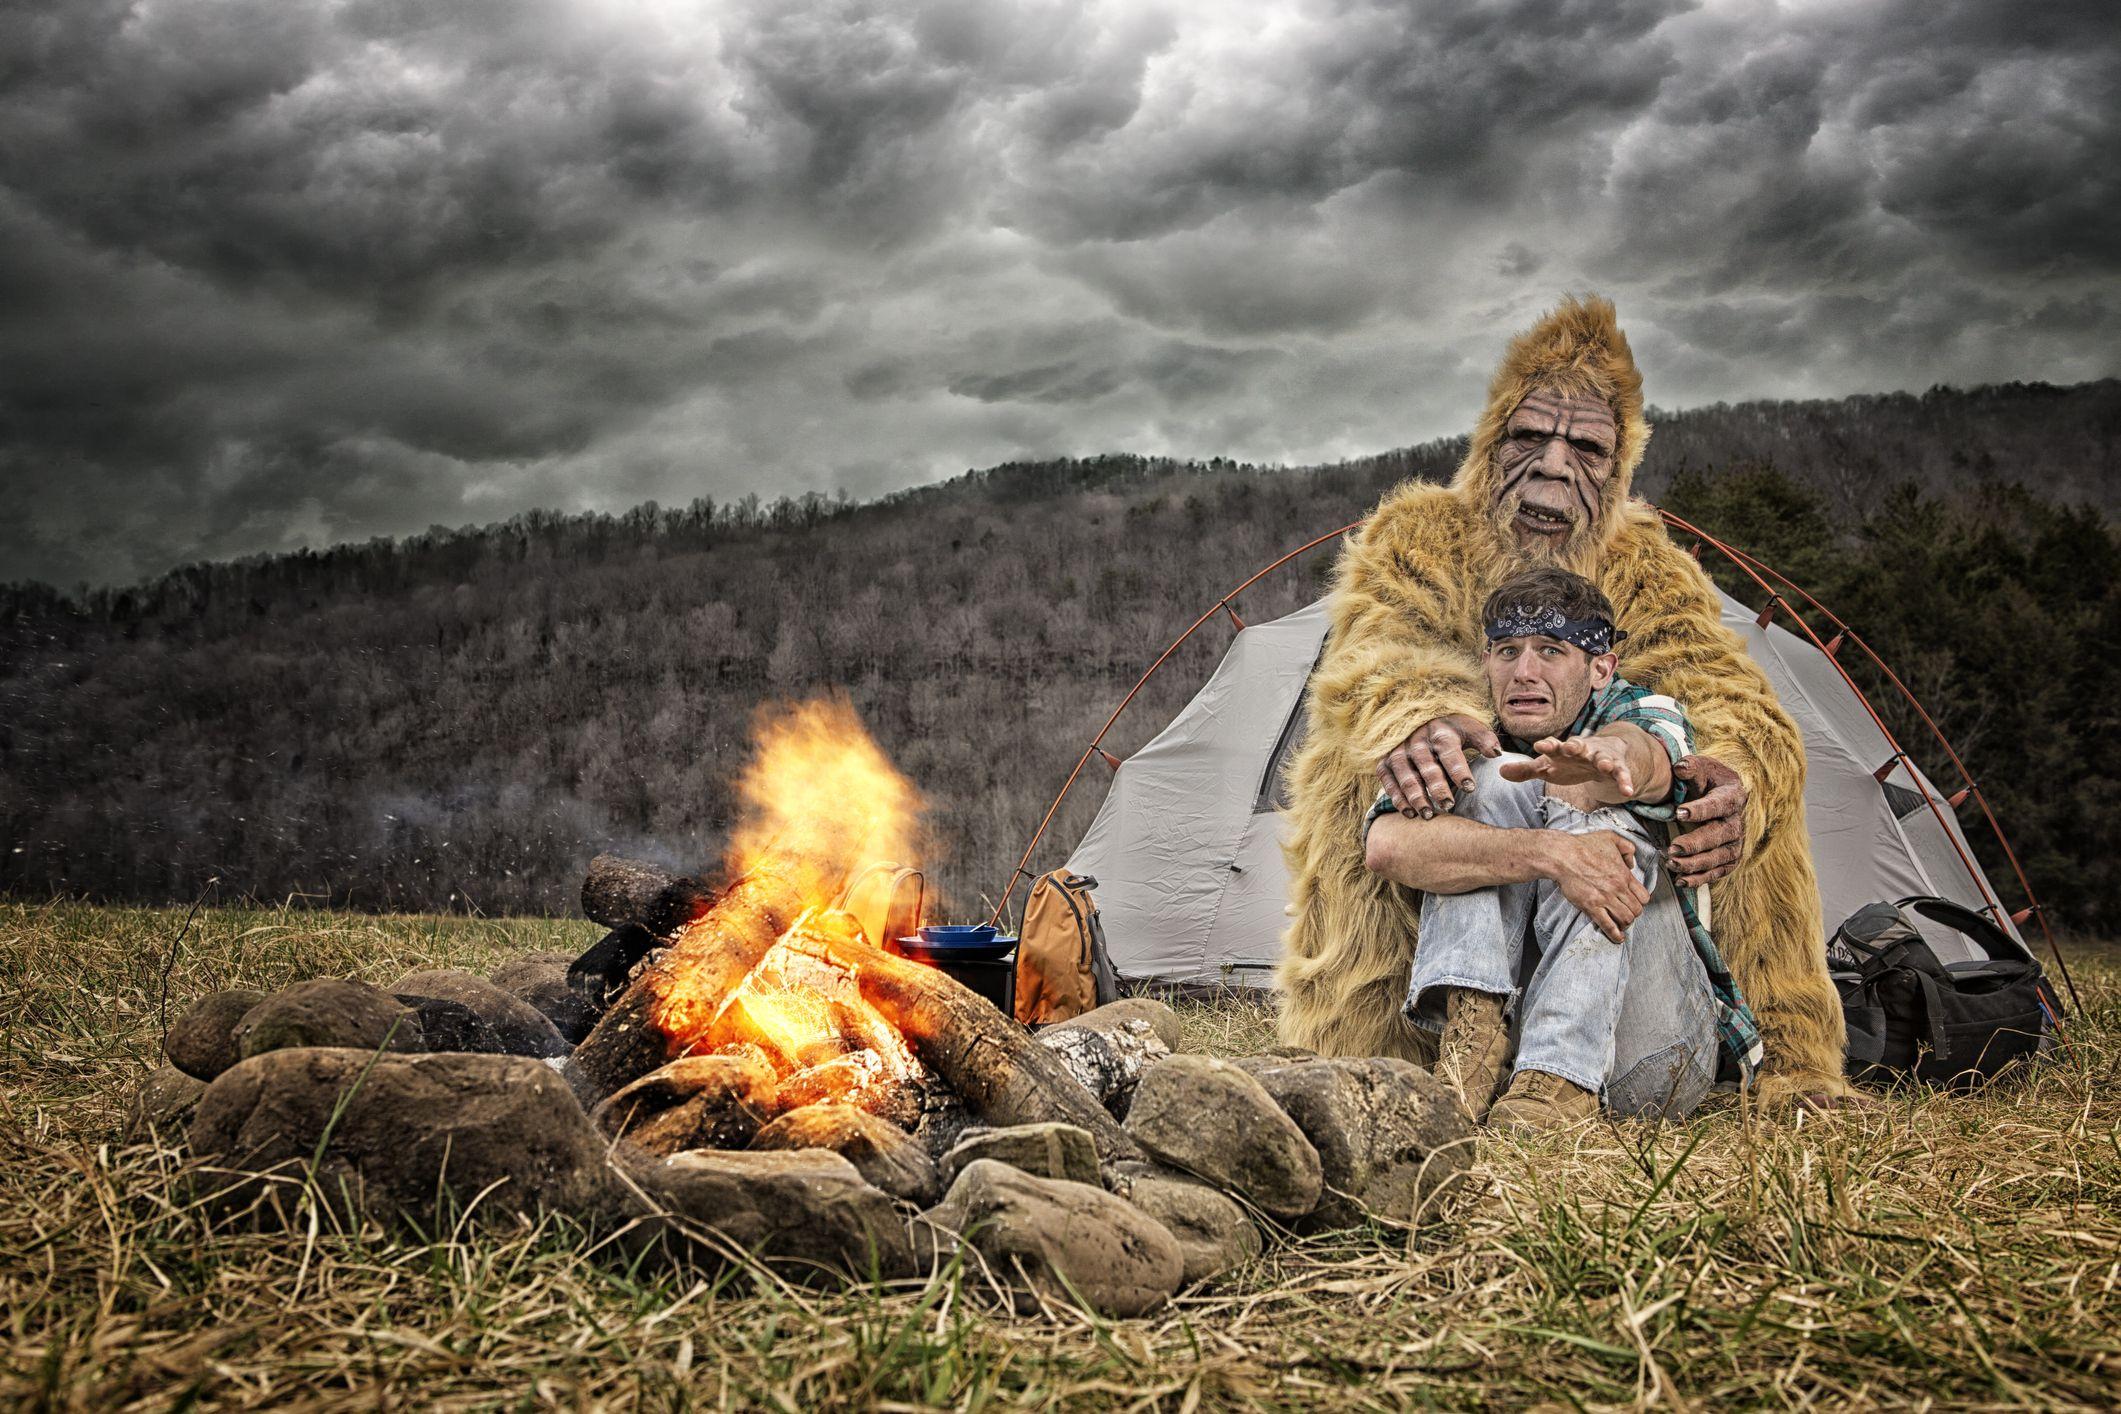 Bigfoot hugs a scared camper